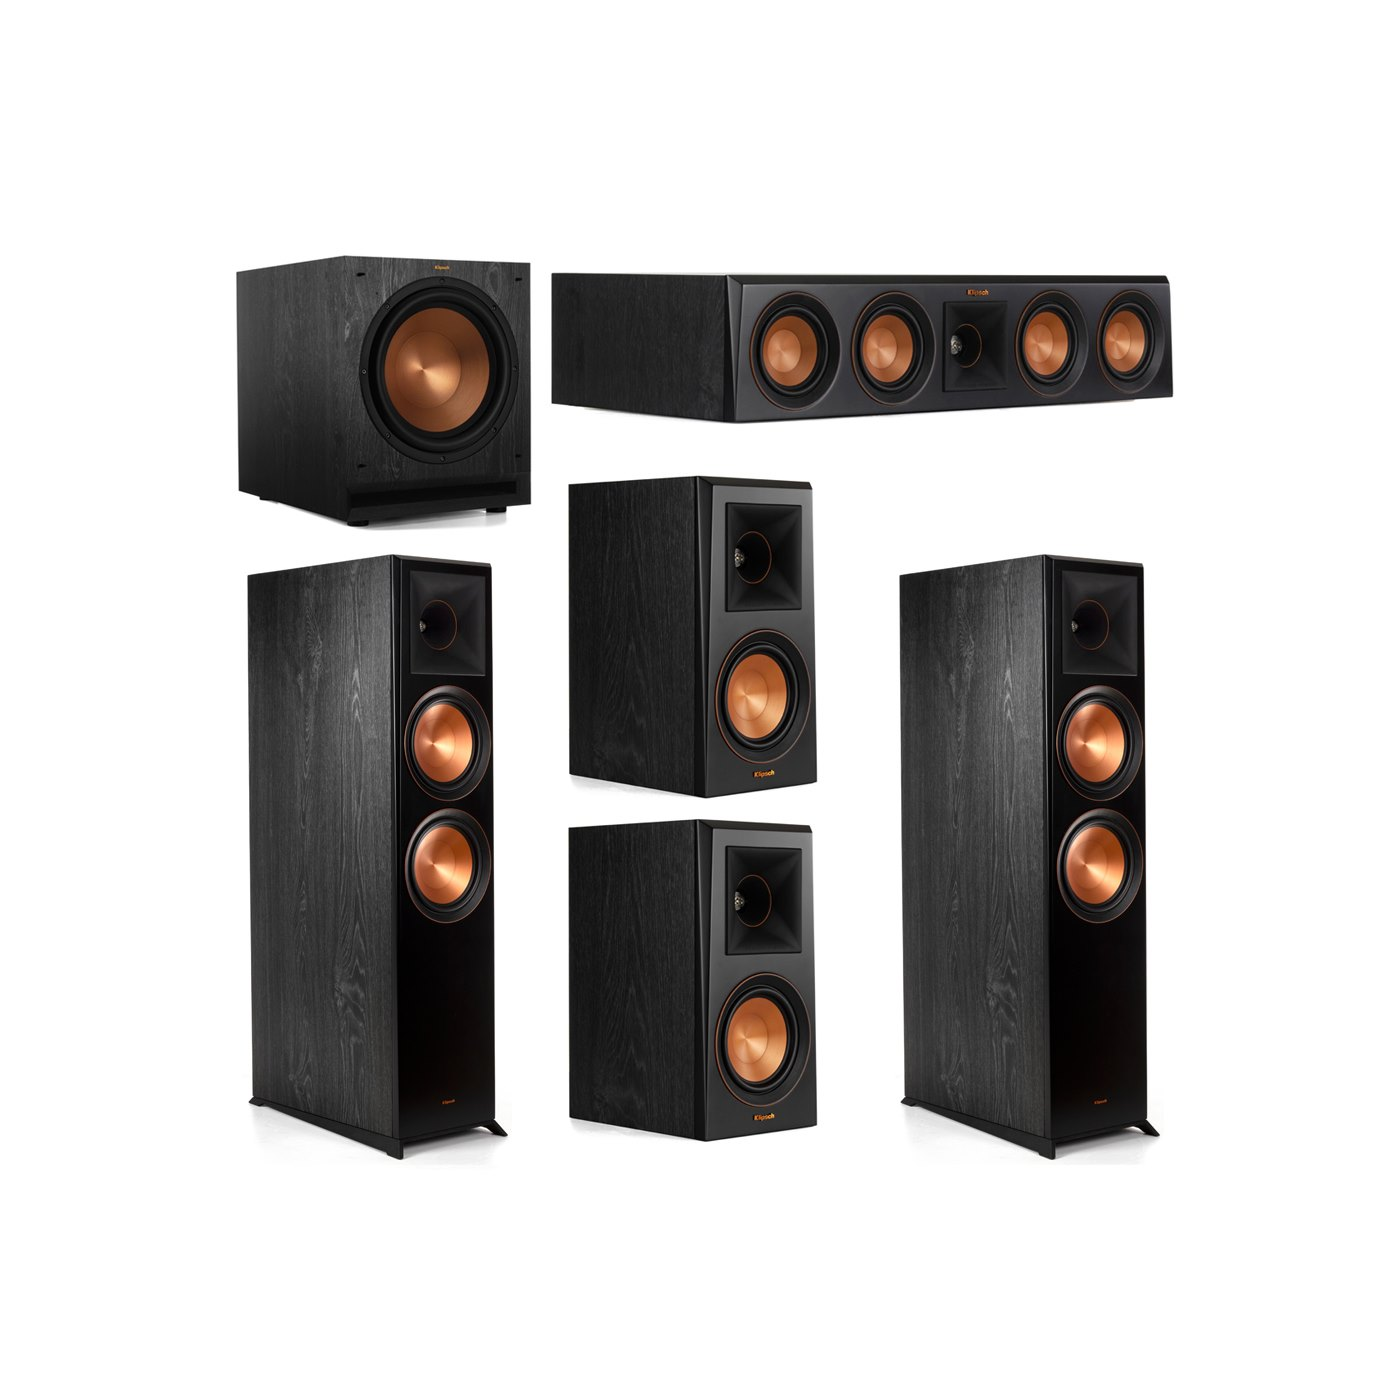 Klipsch 5.1 System with 2 RP-8000F Floorstanding Speakers, 1 Klipsch RP-404C Center Speaker, 2 Klipsch RP-500M Surround Speakers, 1 Klipsch SPL-120 Subwoofer